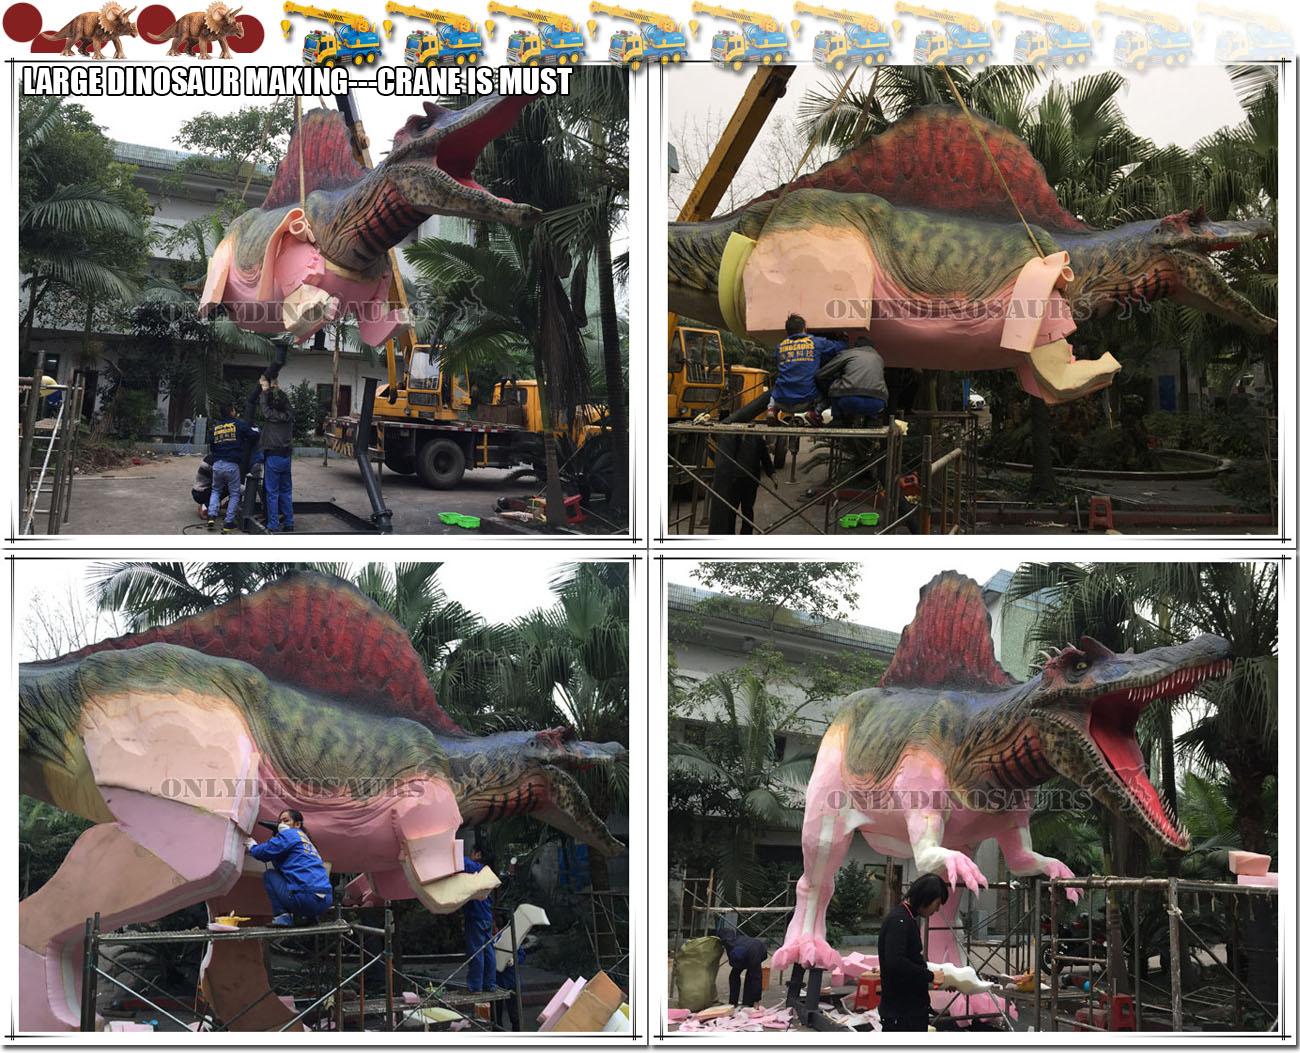 Crane for Large Dinosaur Making